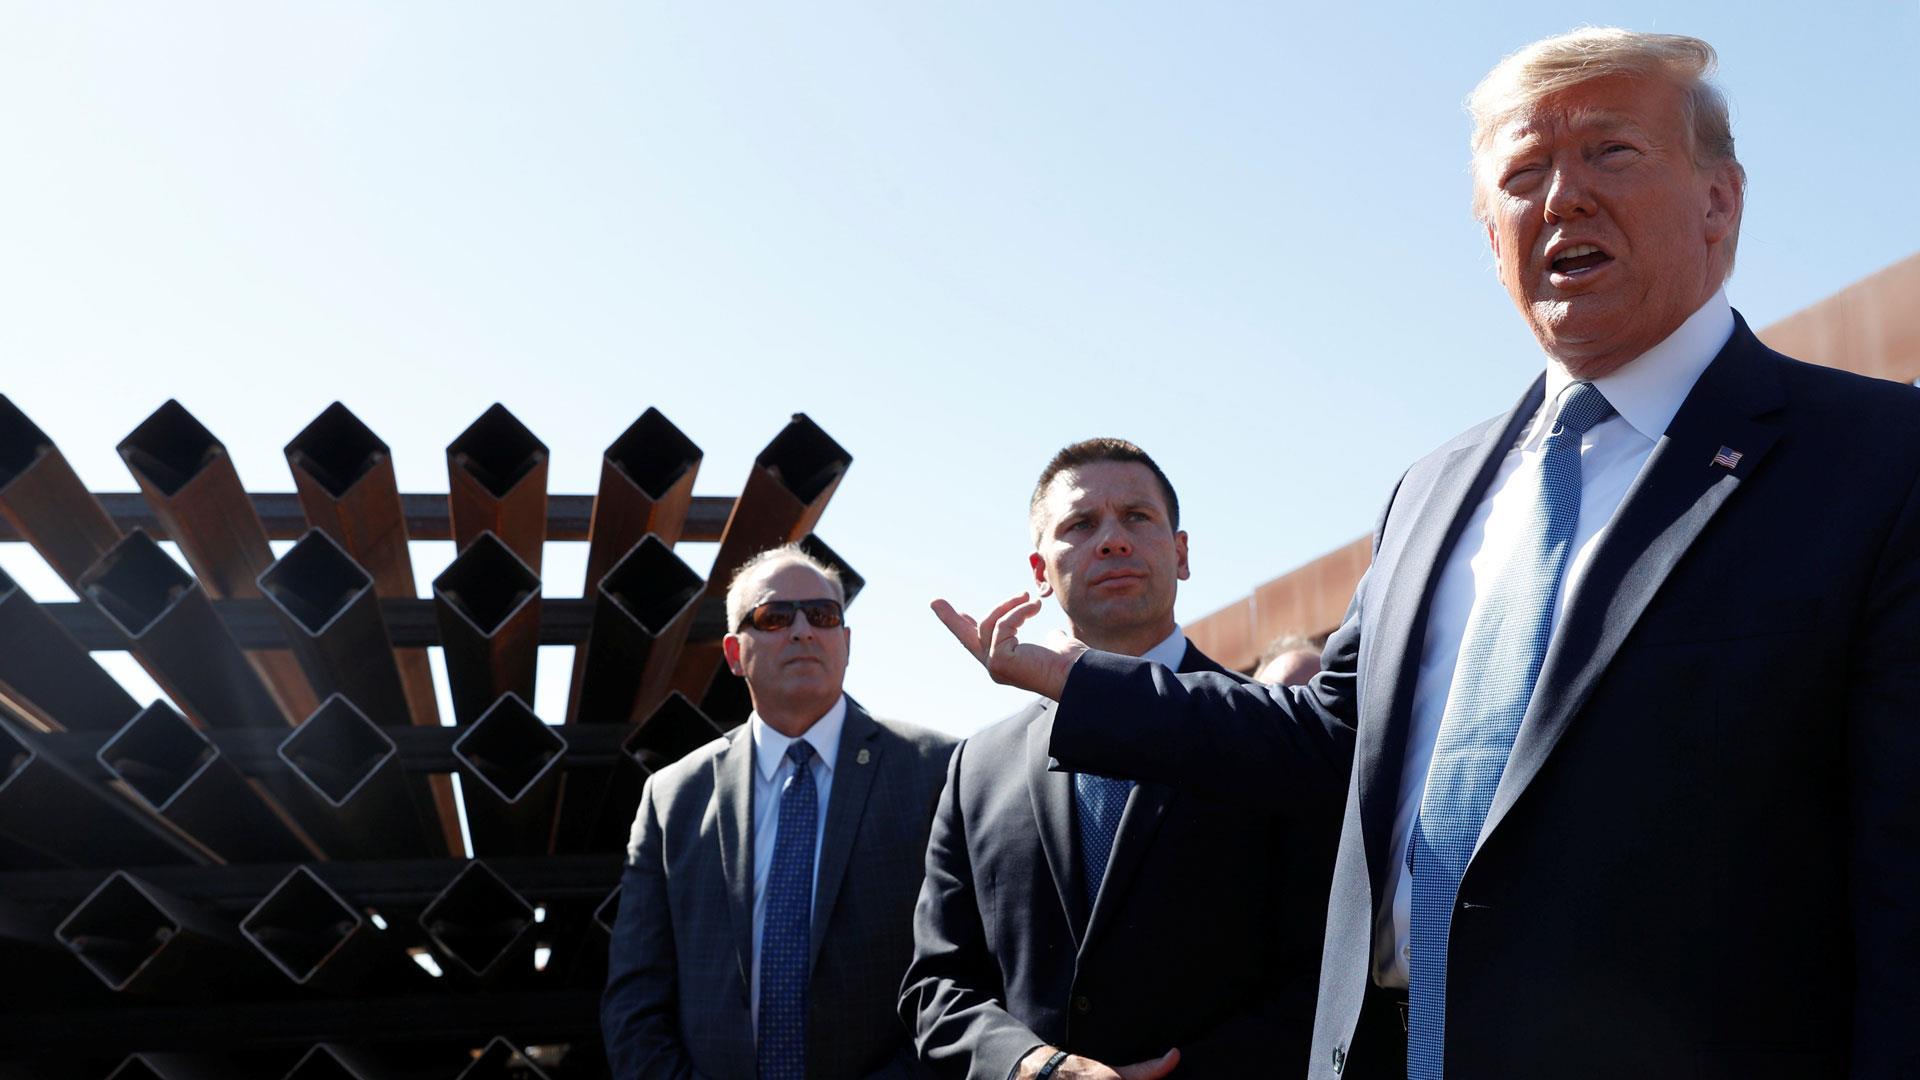 Trump tours California border wall, praises its construction